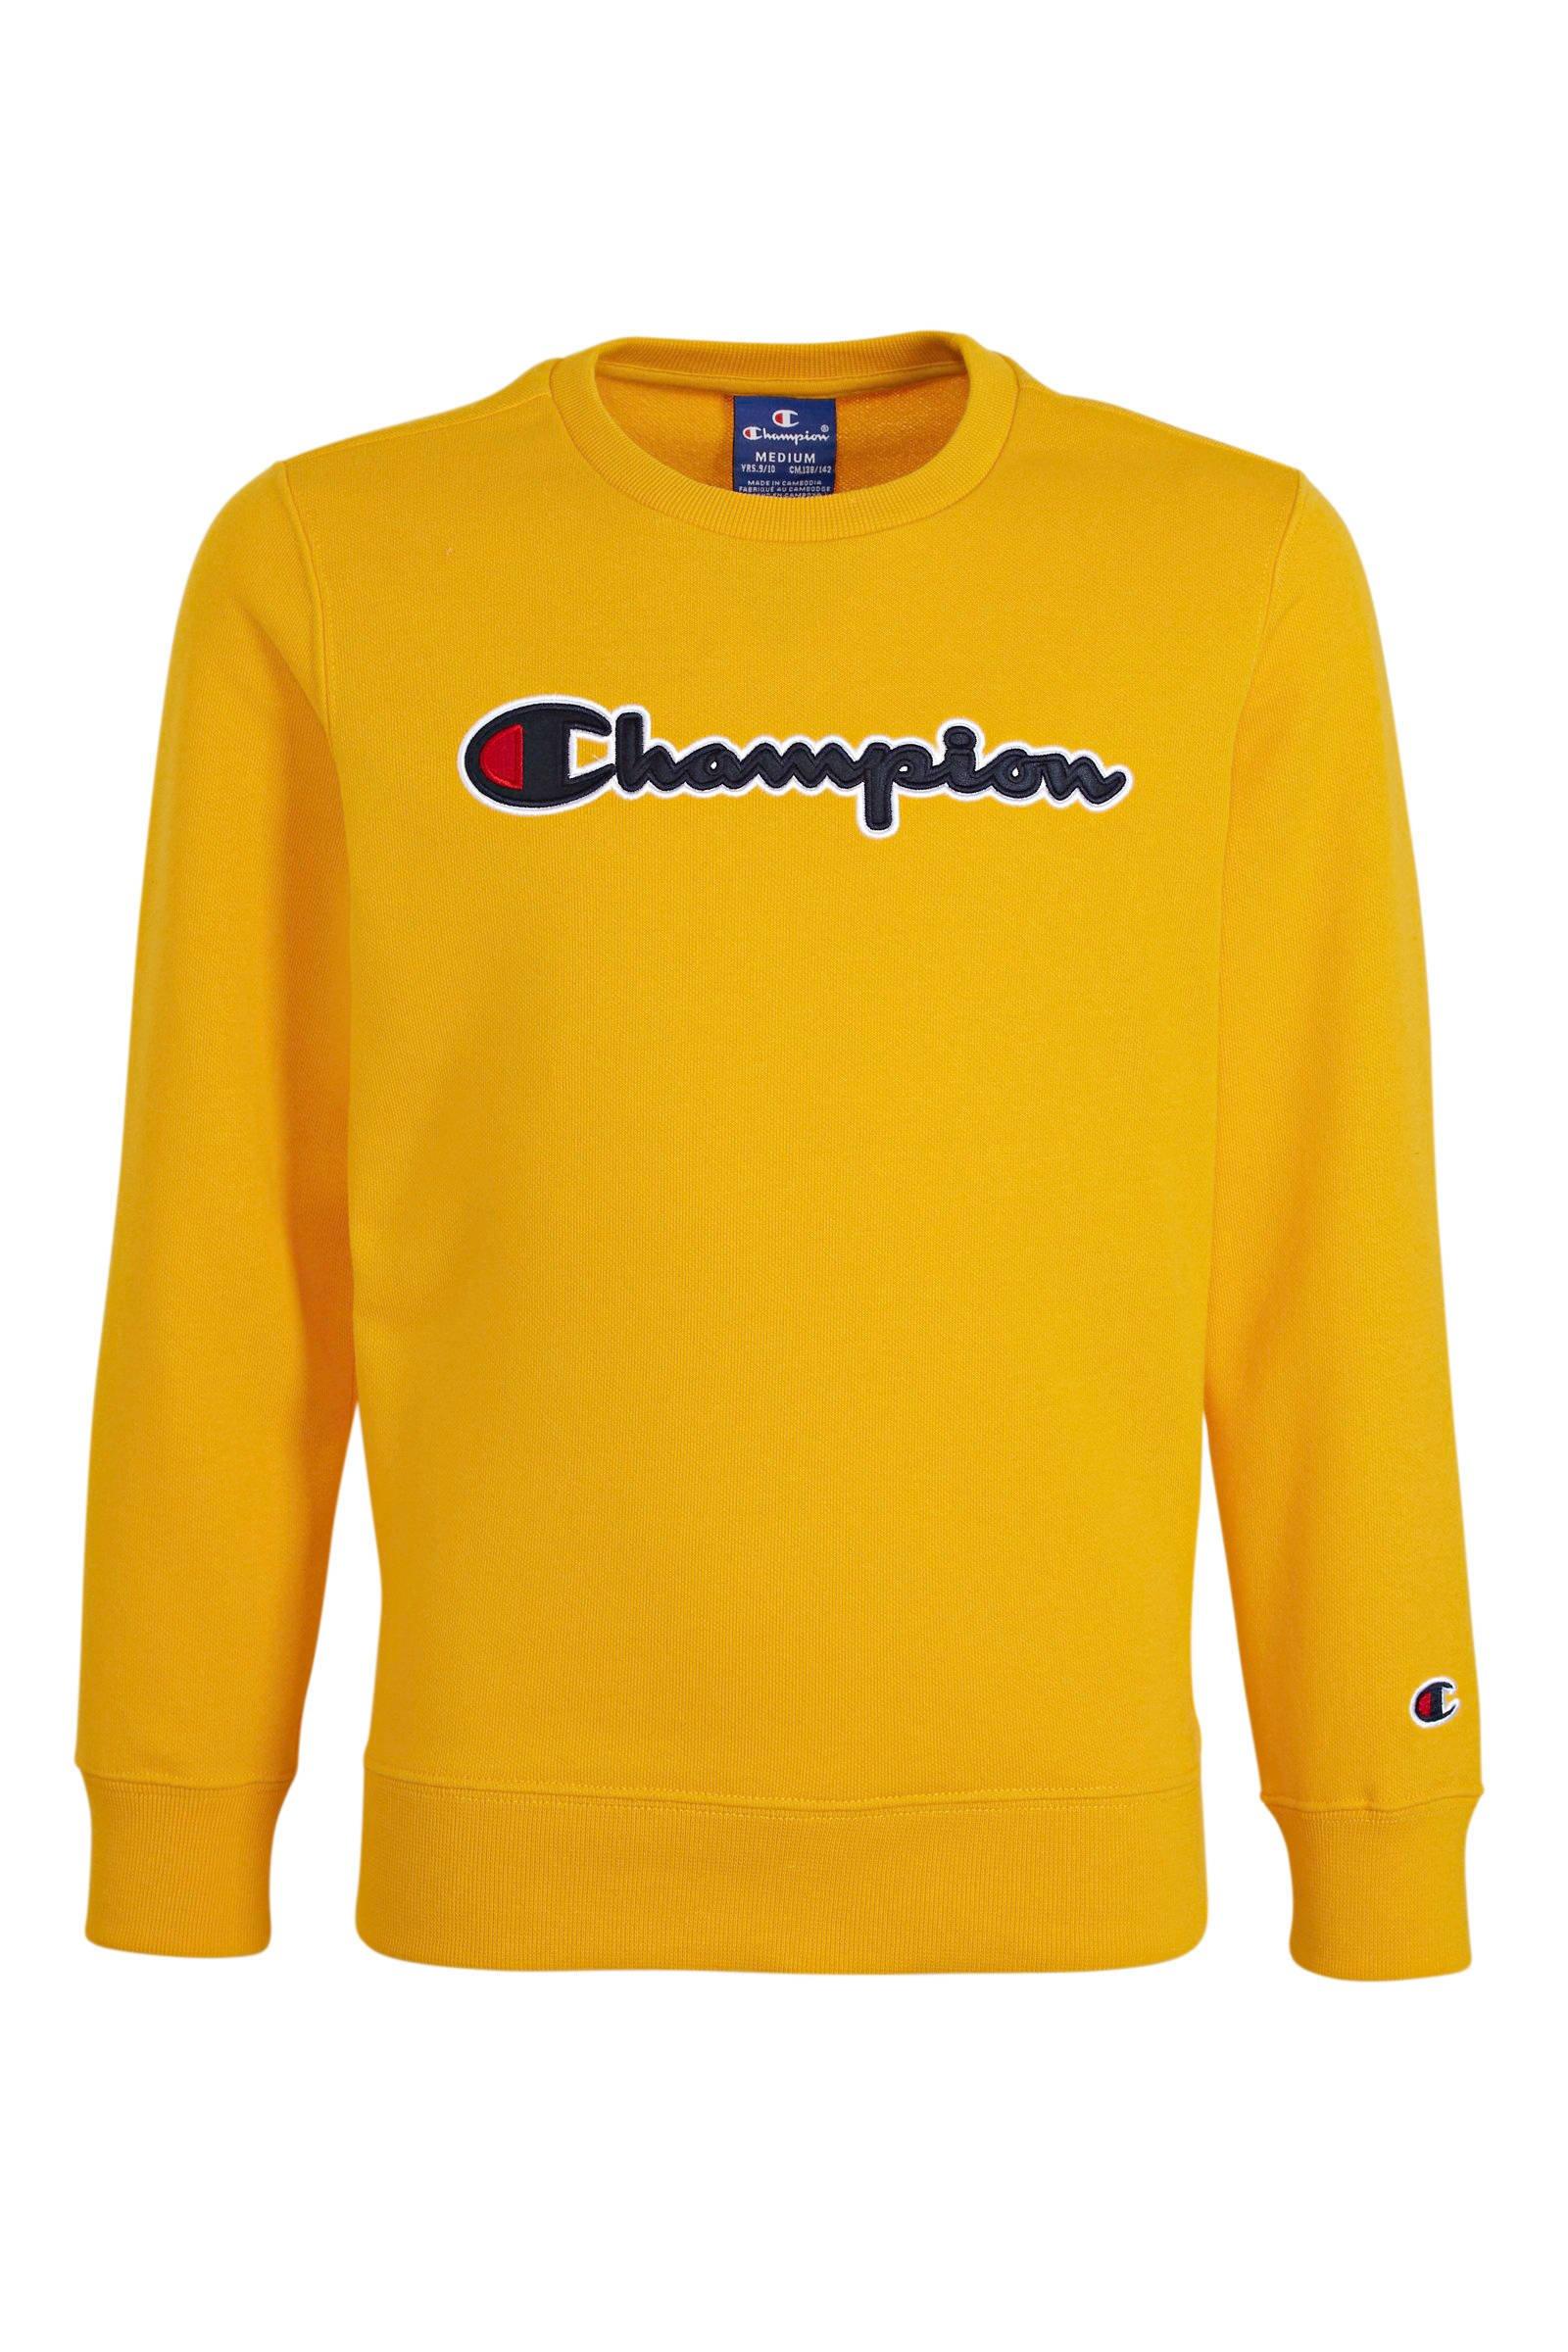 Champion artikelen kopen Vind jouw Champion artikelen